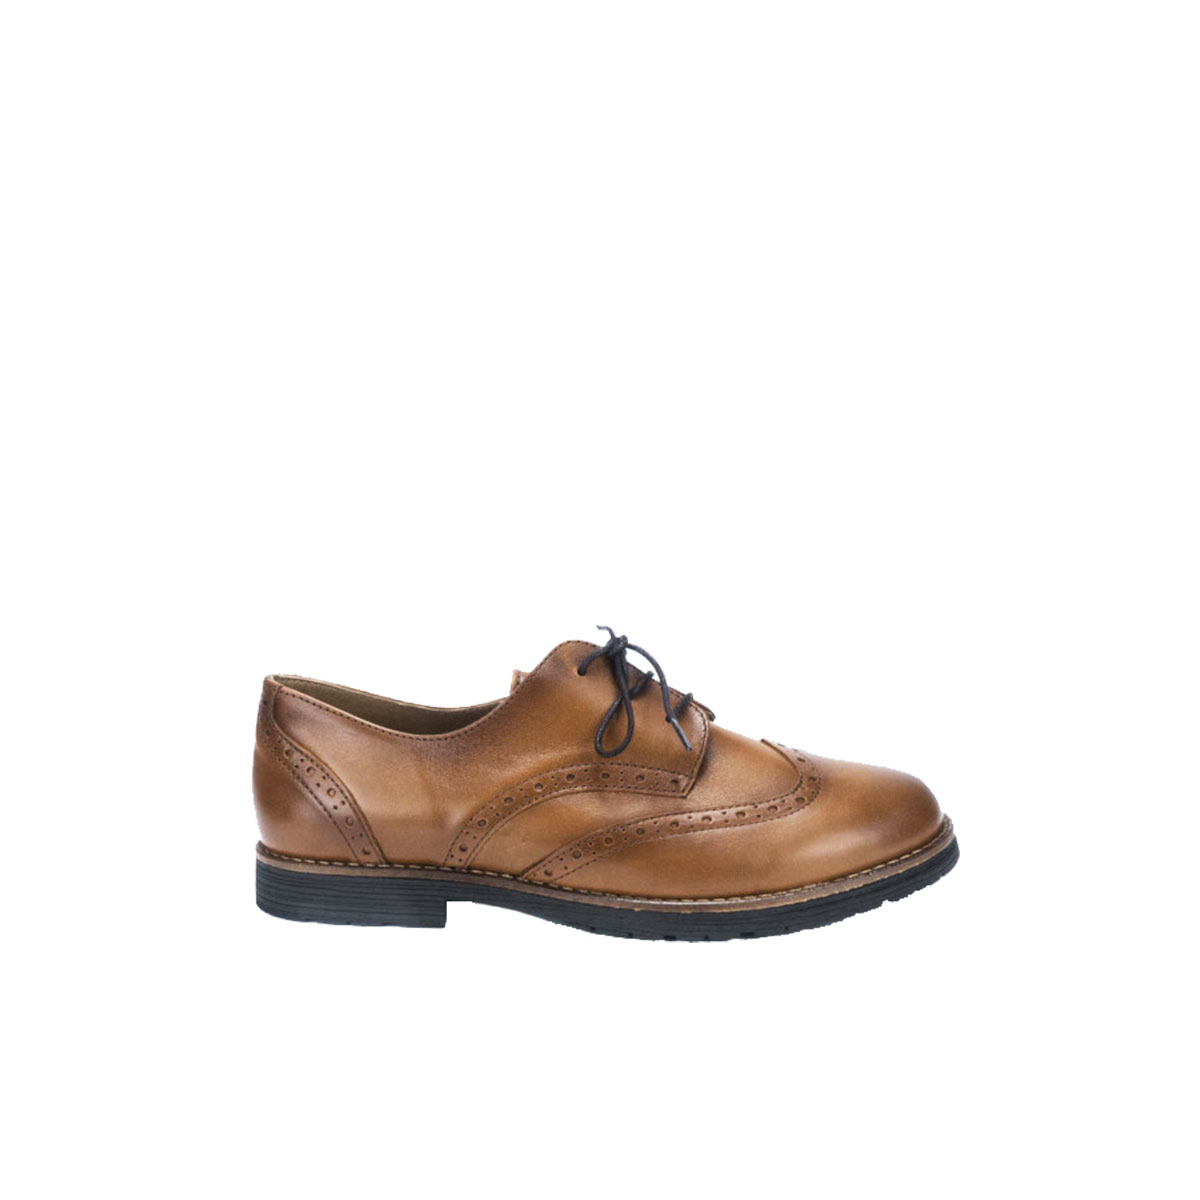 ea29b9ea2da RAGAZZA 0183 Γυναικείο Παπούτσι Δετό Oxford Δέρμα Ταμπά